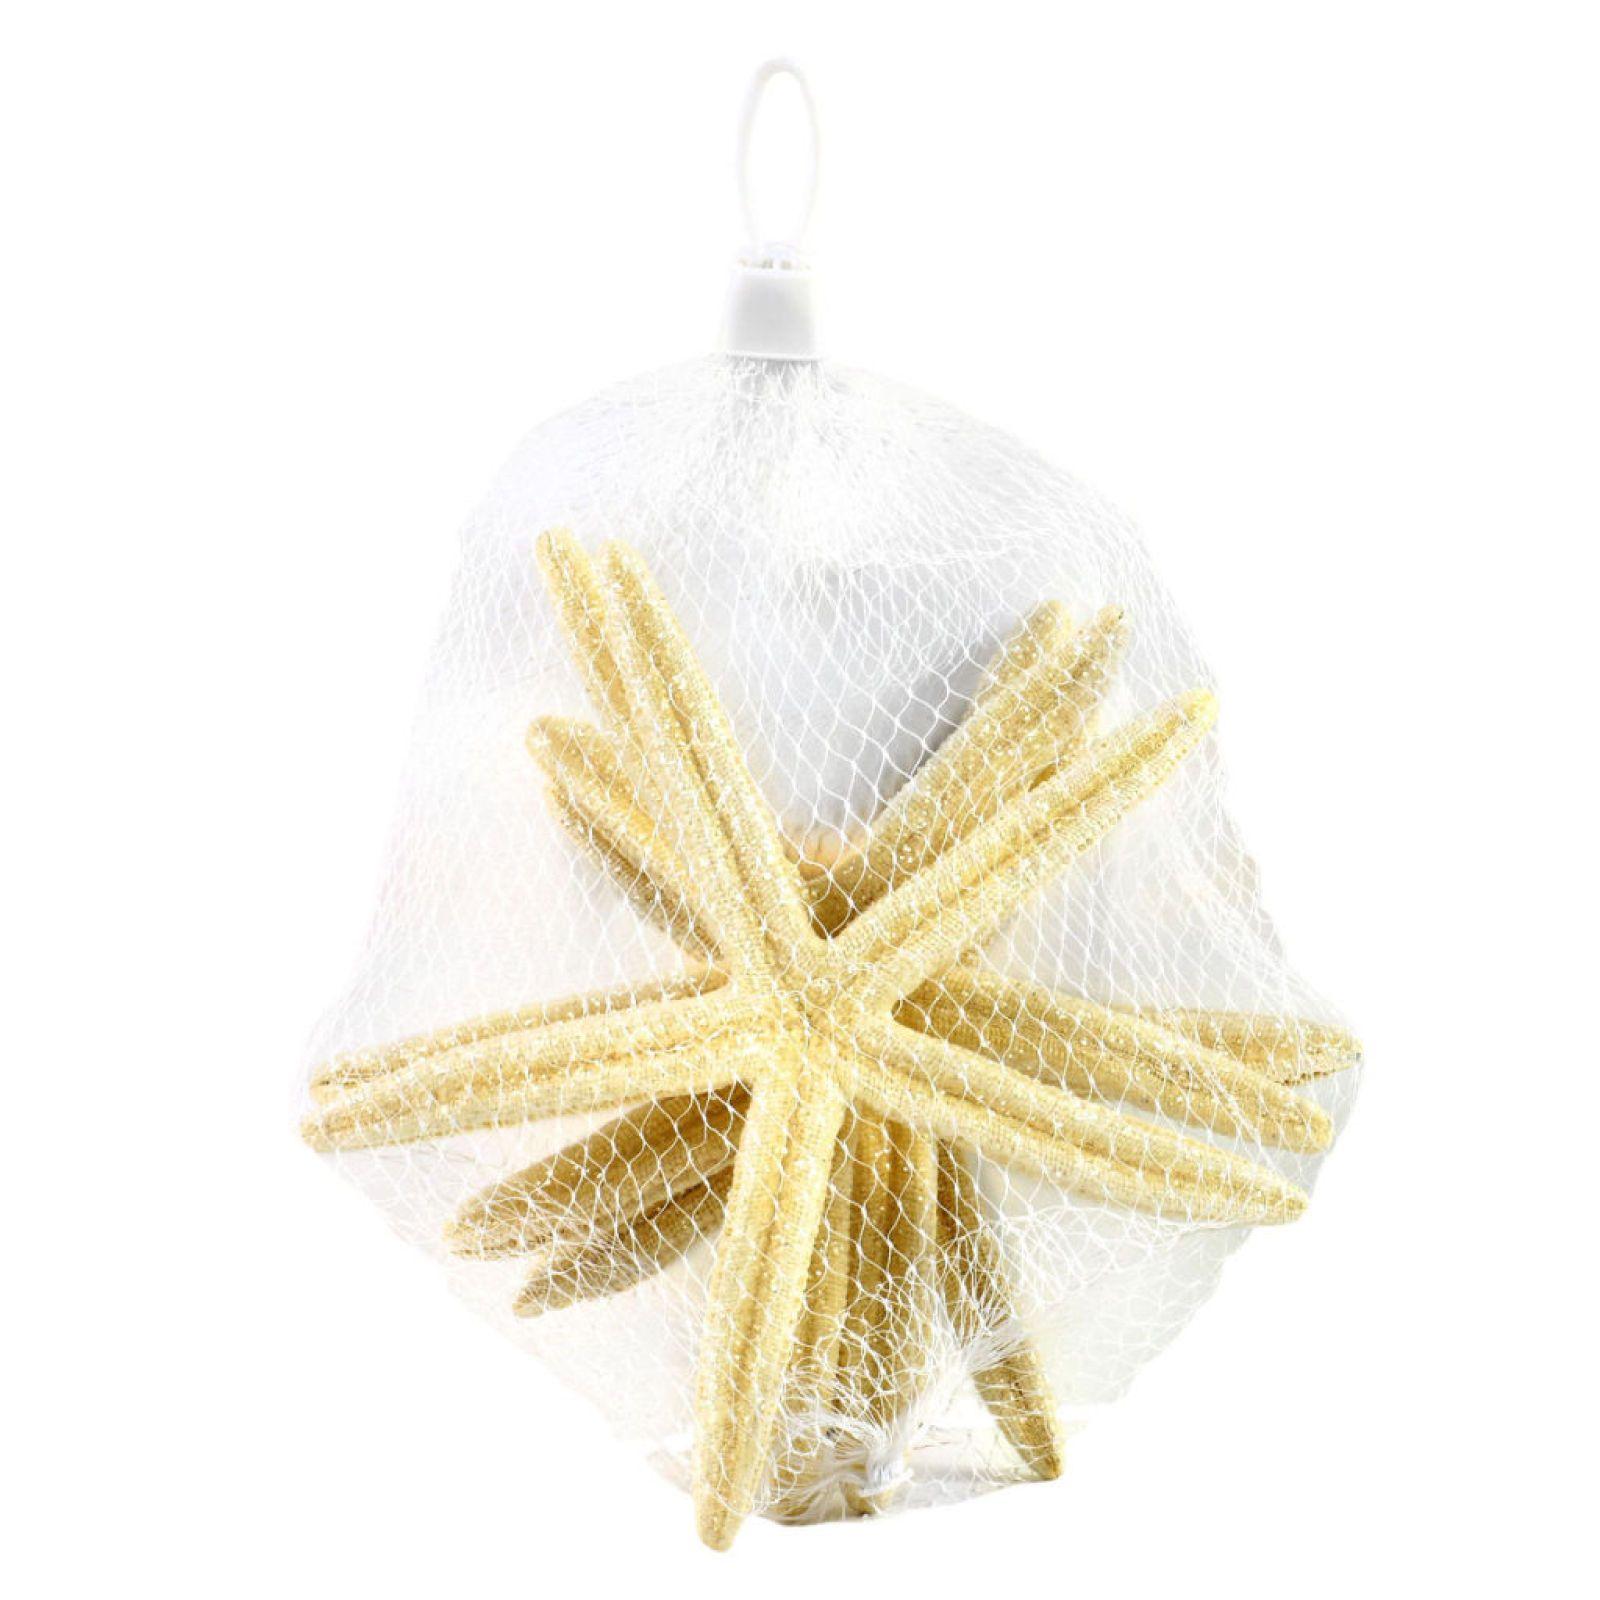 Ashland Glitter Starfish | Starfish, Place card and Floral arrangement